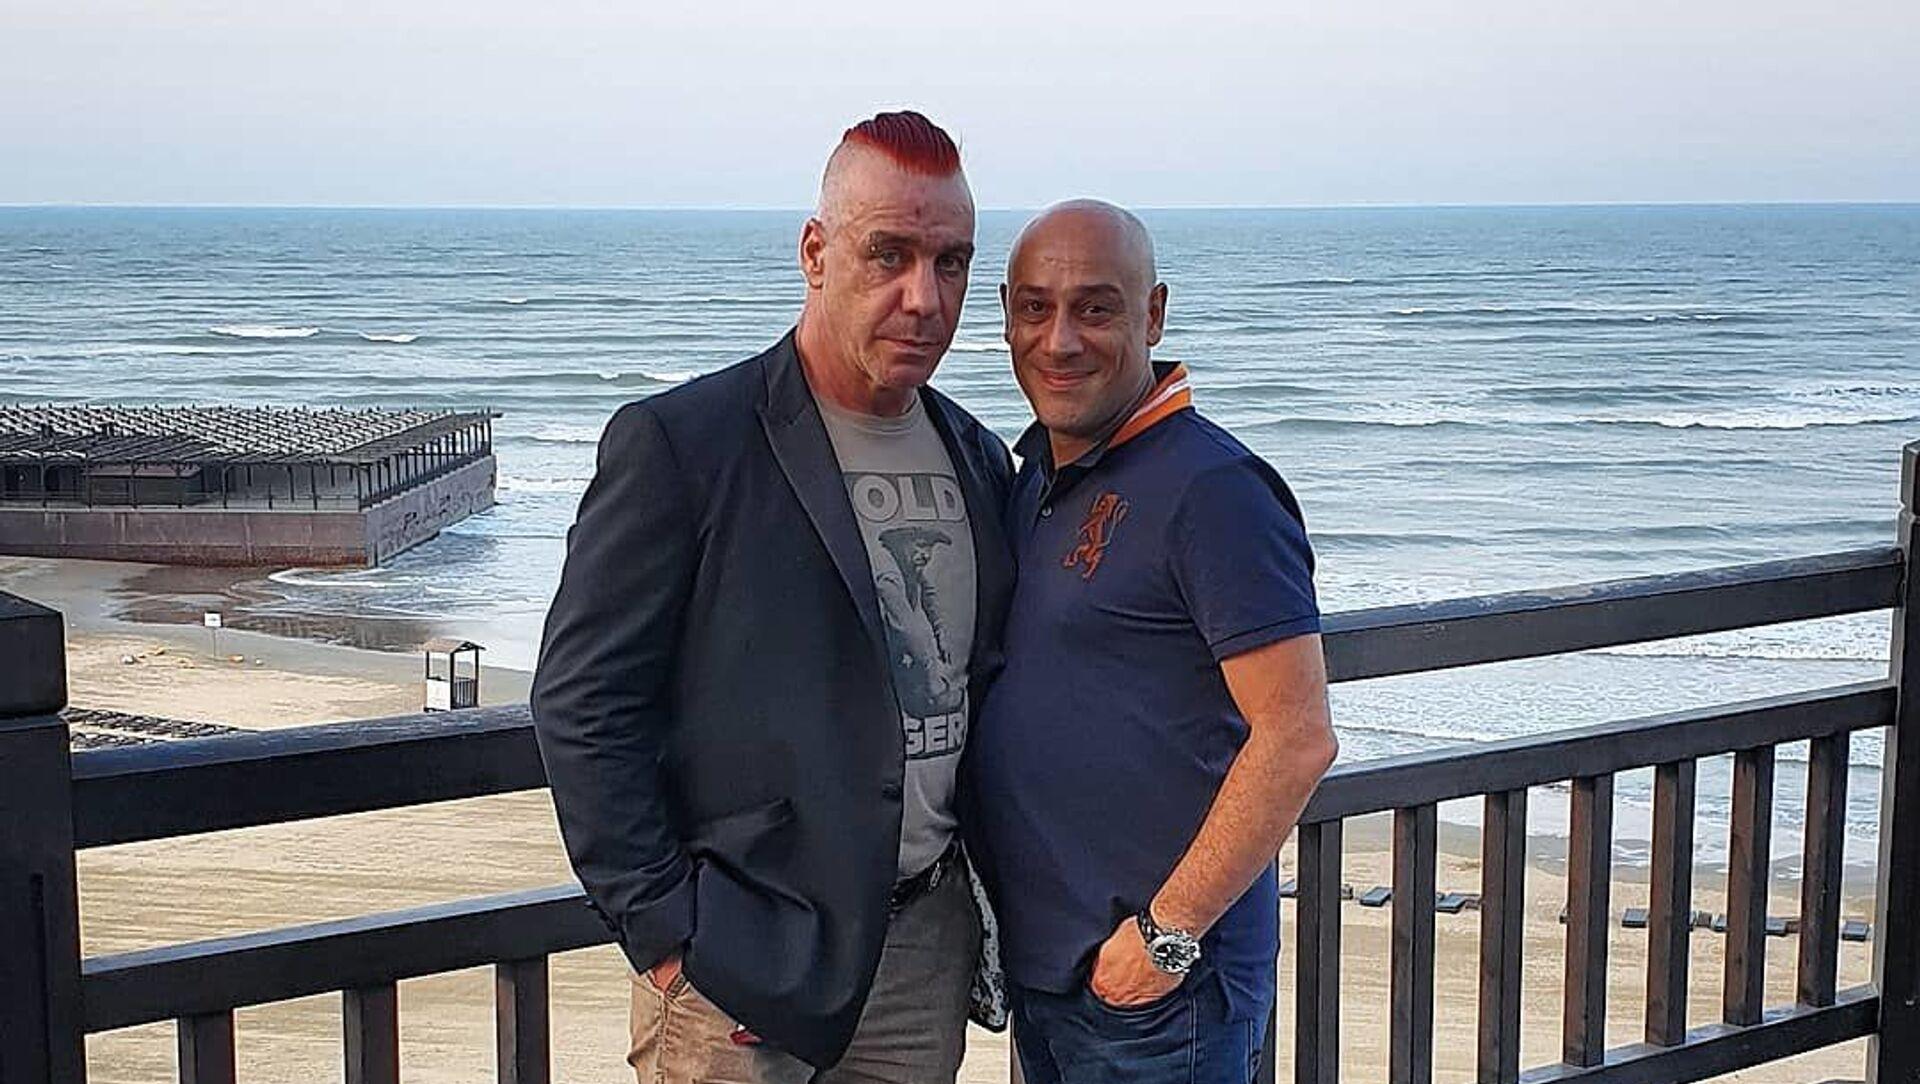 Солист рок-группы «Rammstein» Тилль Линдеманн и его продюсер азербайджанец Анар Рейбанд  - Sputnik Азербайджан, 1920, 30.08.2021